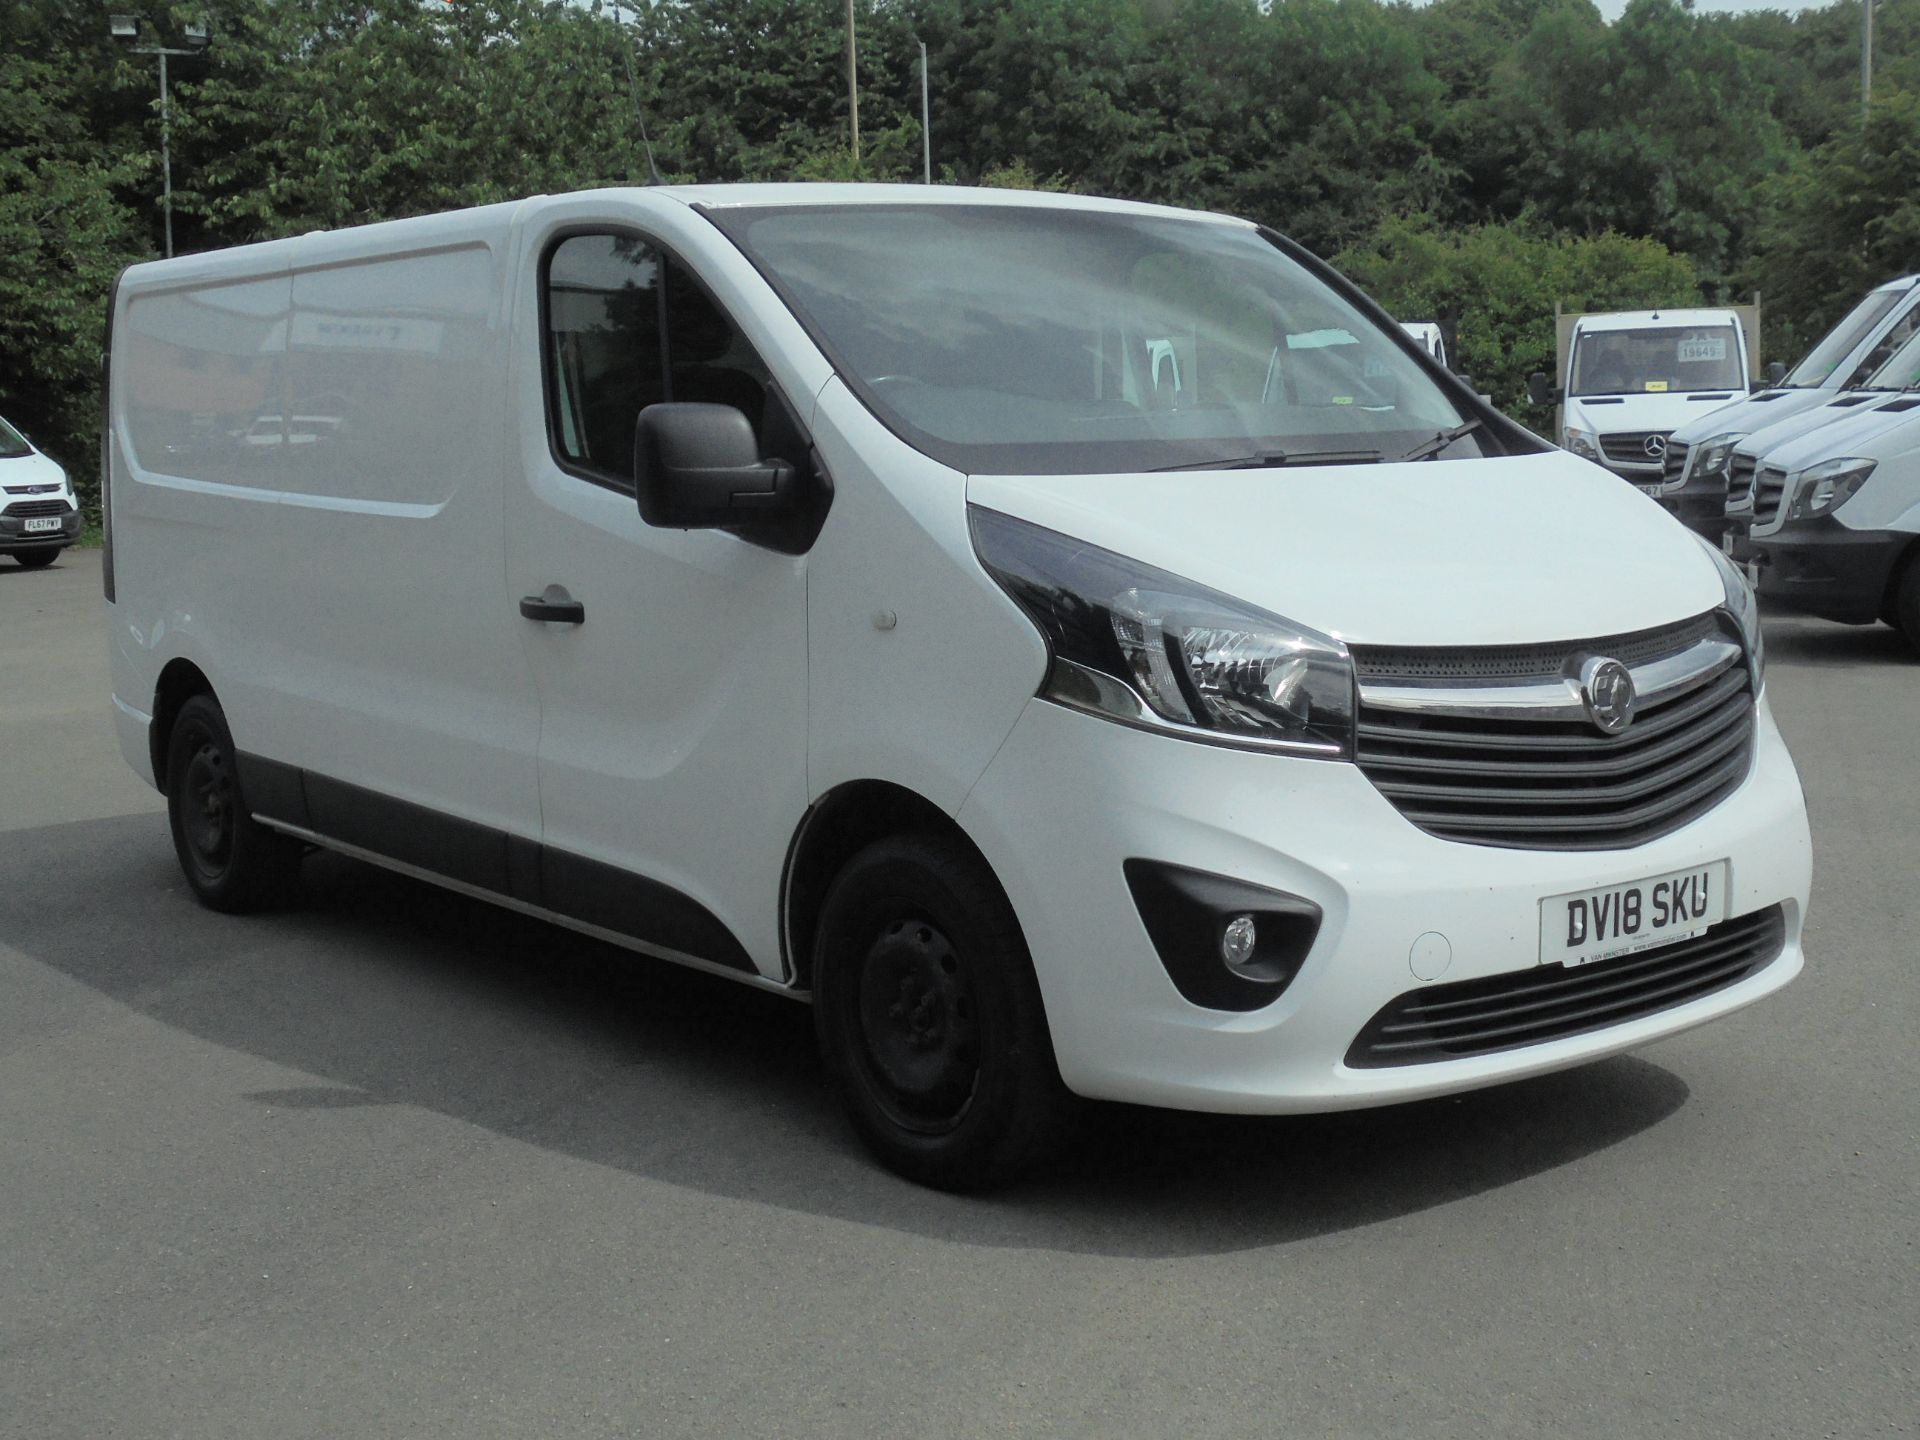 2018 Vauxhall Vivaro 2900 1.6Cdti 120Ps Sportive H1 Van (DV18SKU)